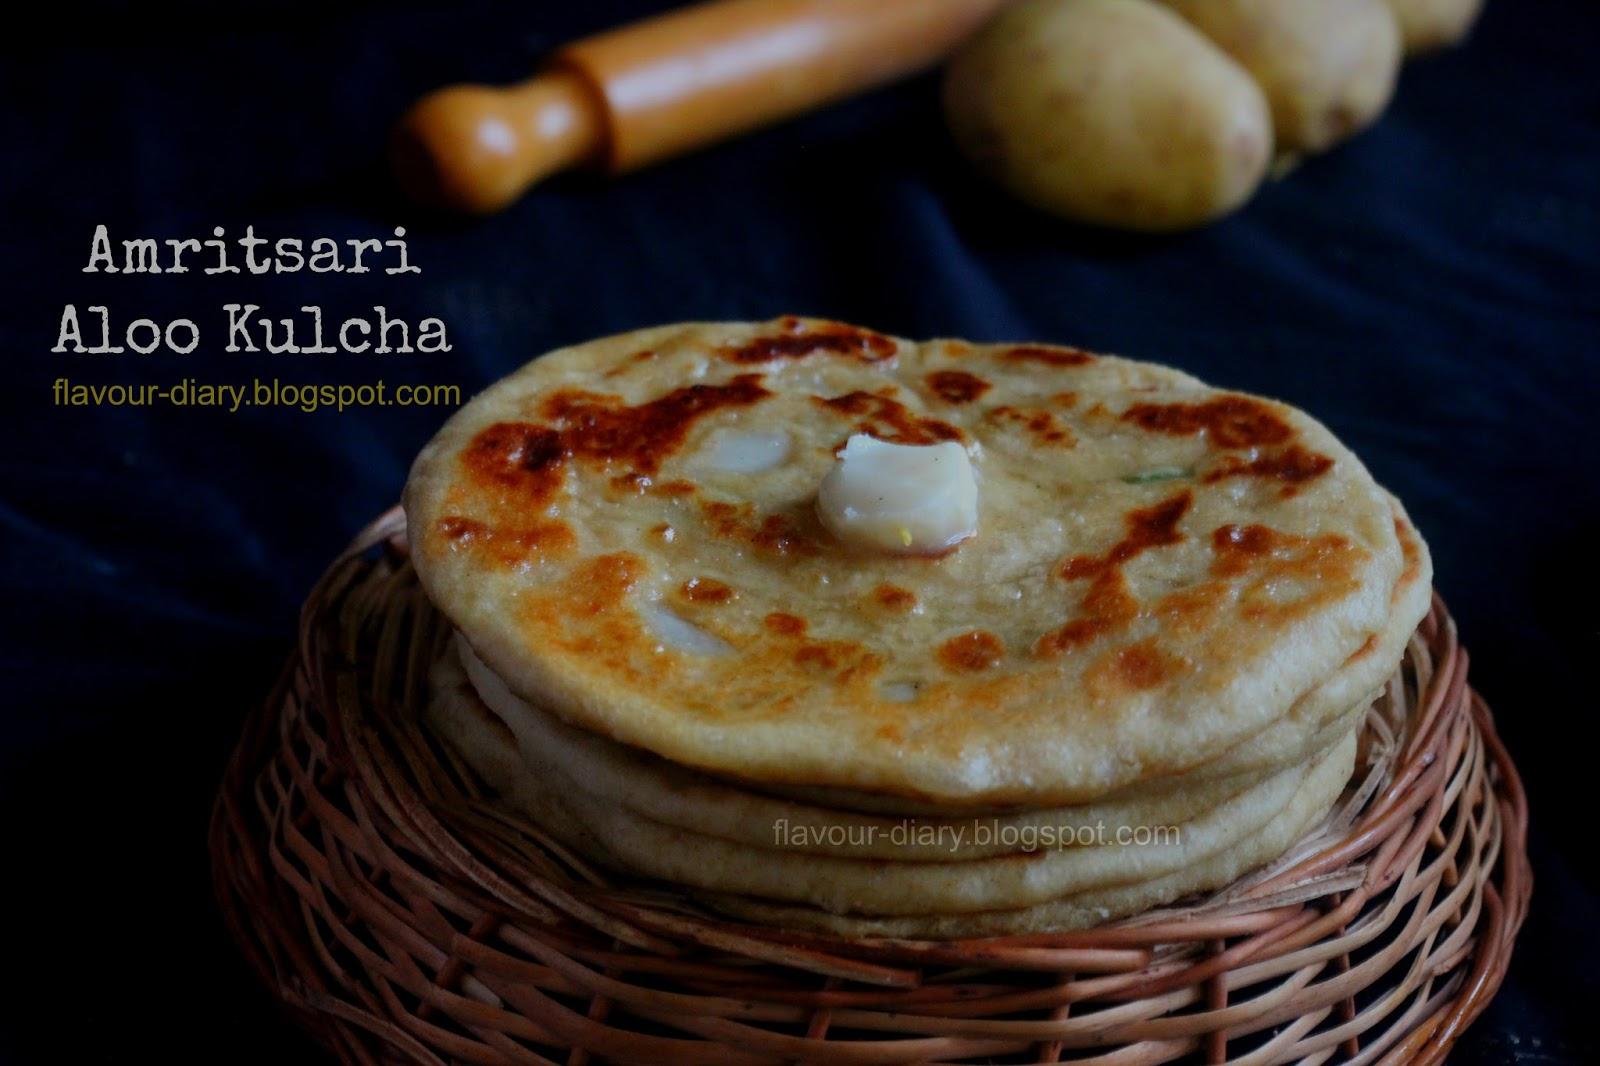 Flavour diary amritsari aloo kulcha recipe indian flat bread with amritsari aloo kulcha recipe indian flat bread with spicy potato filling flavour diary forumfinder Images